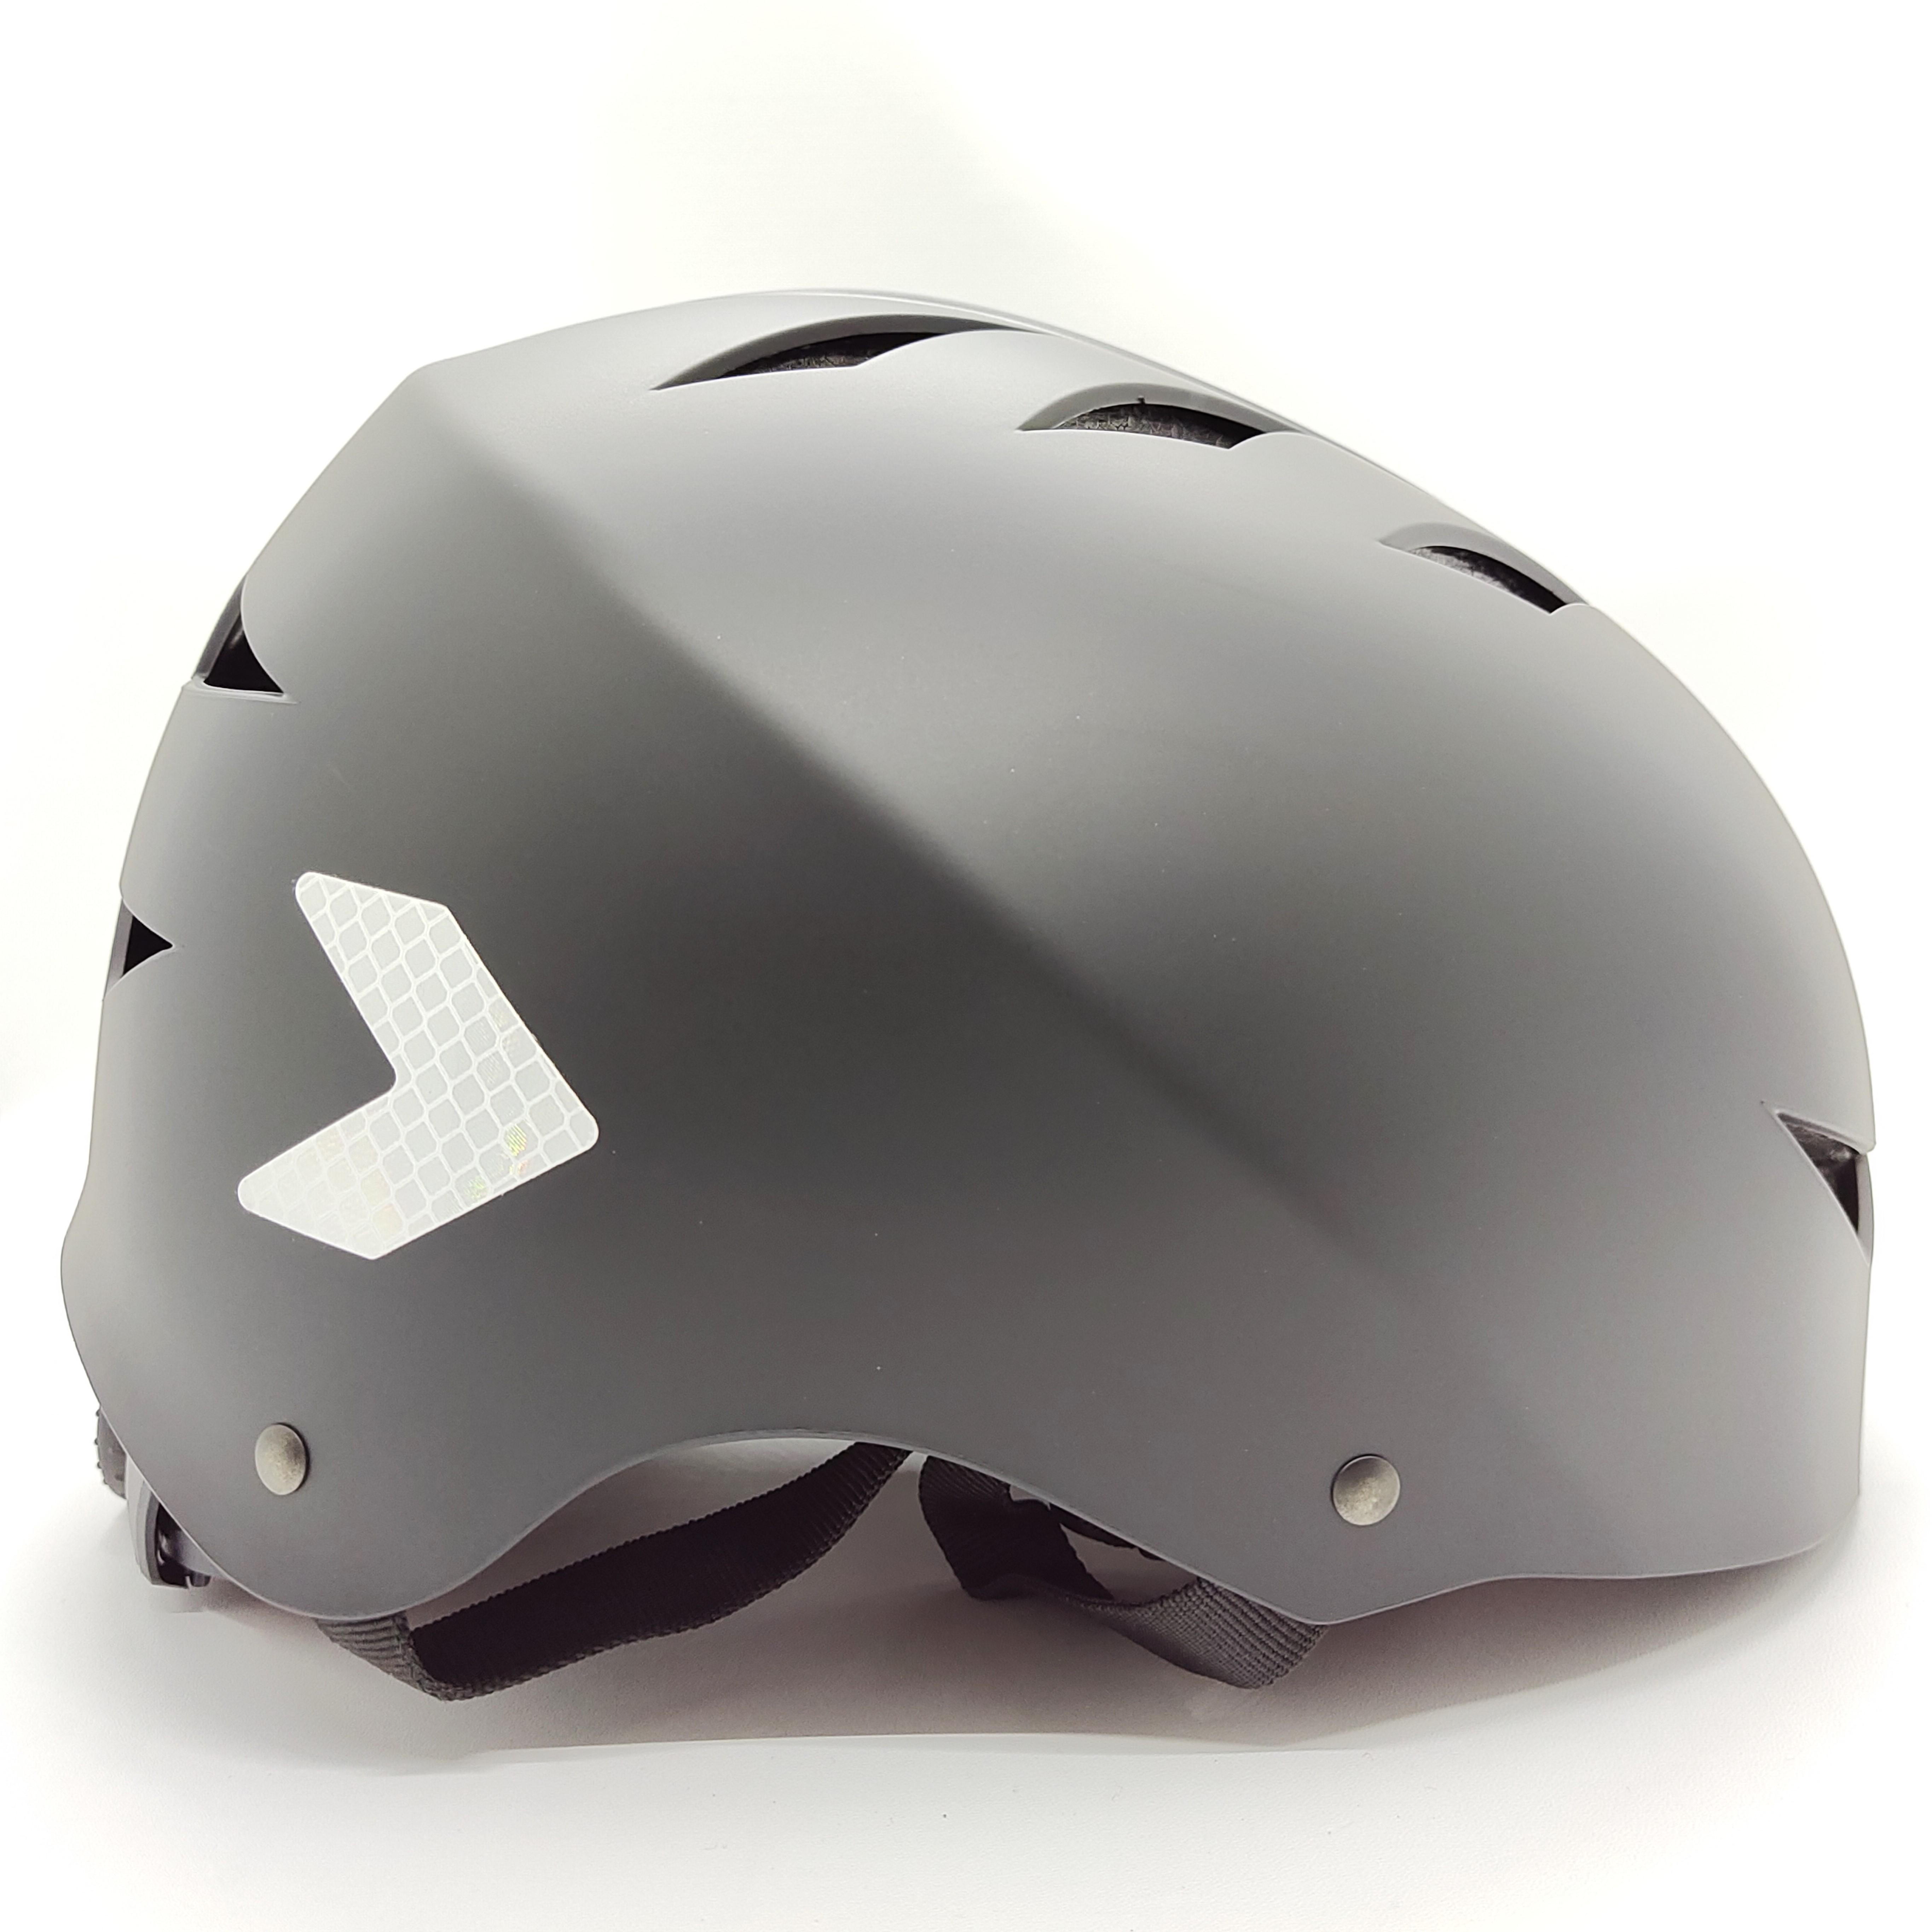 IMG 20200511 115856 - Skutis Gear Helmet